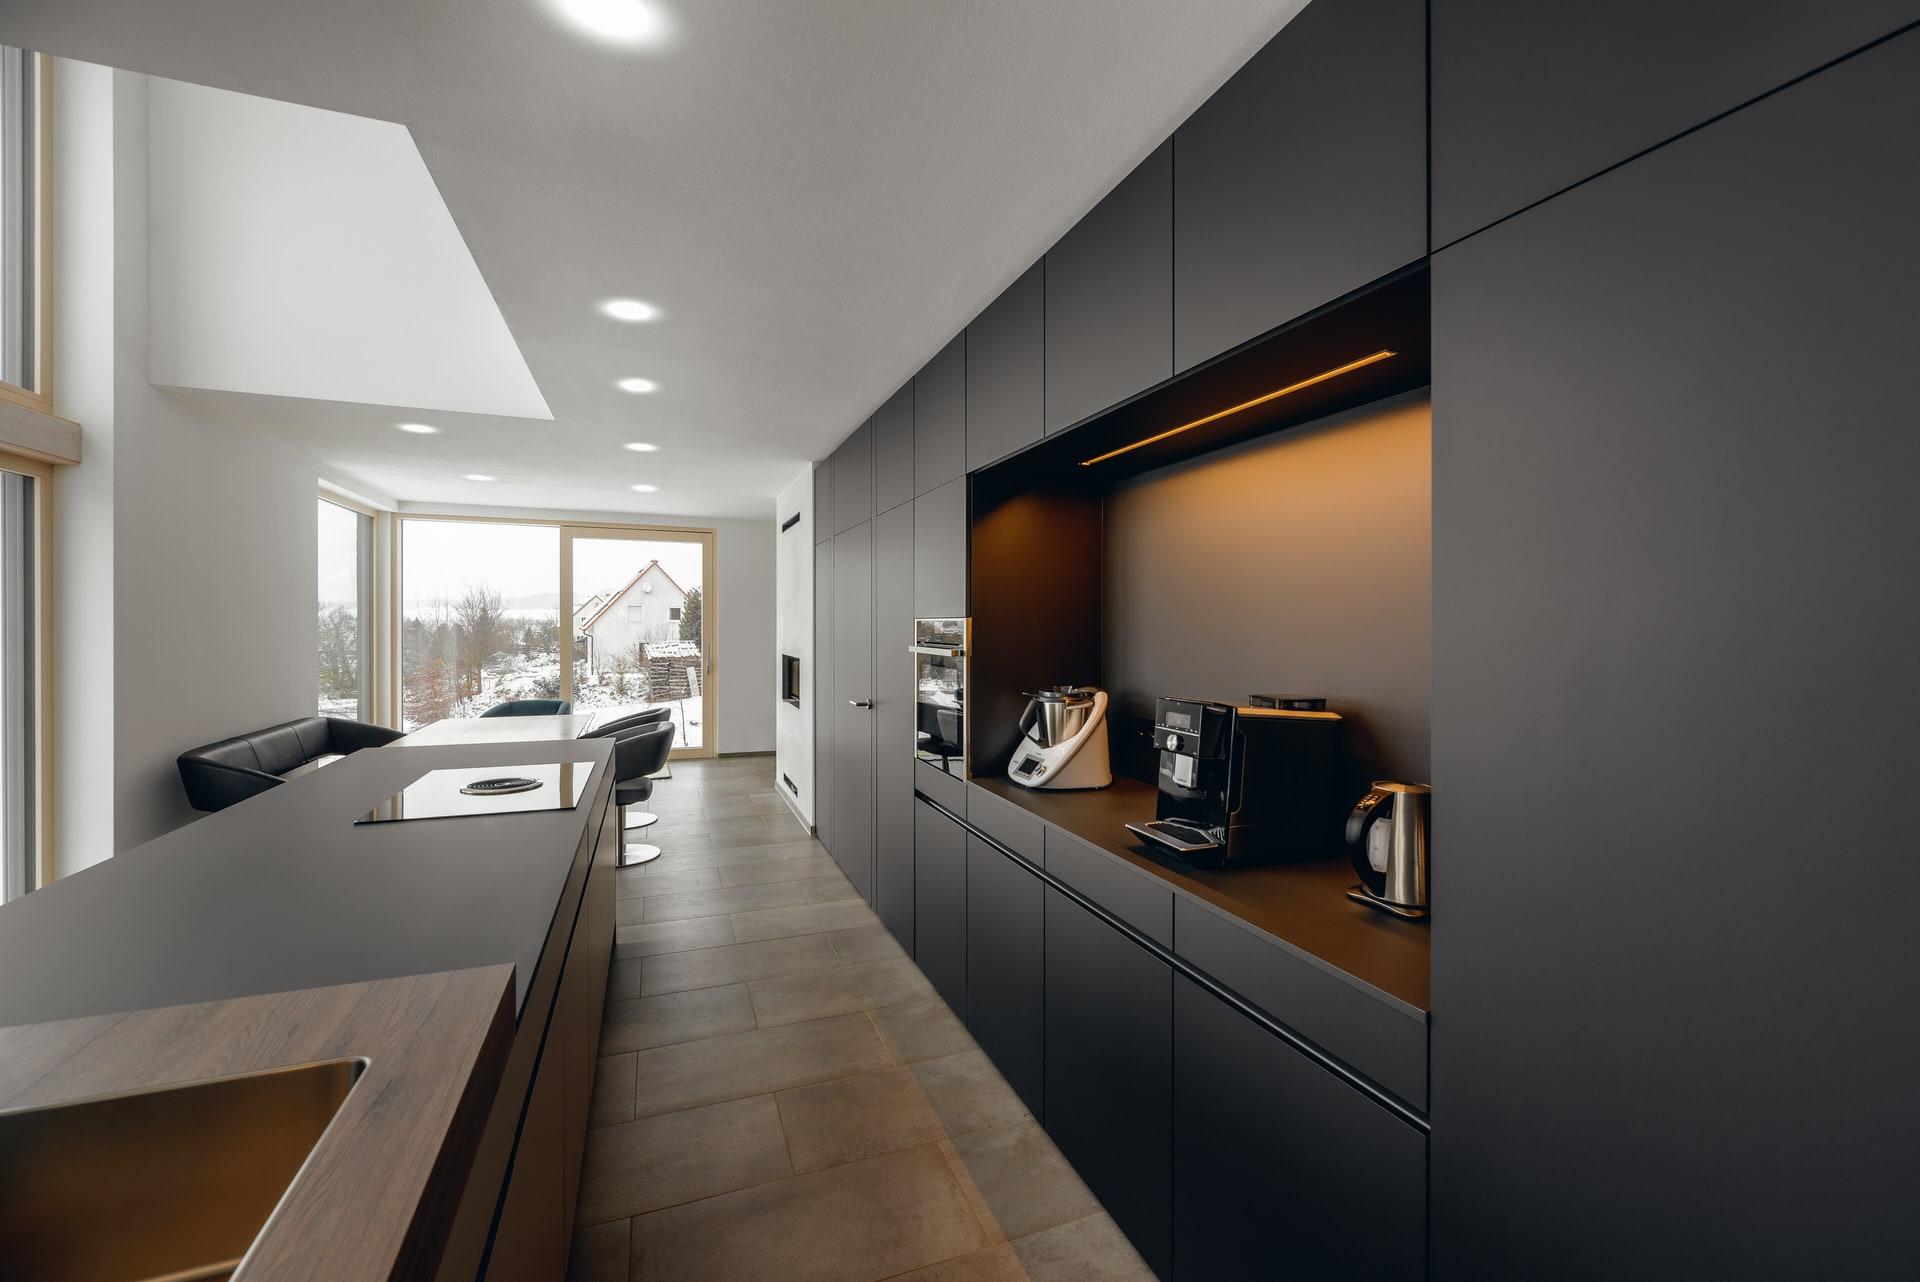 veigl k che s2 veigl k chen bayreuth das k chenstudio. Black Bedroom Furniture Sets. Home Design Ideas